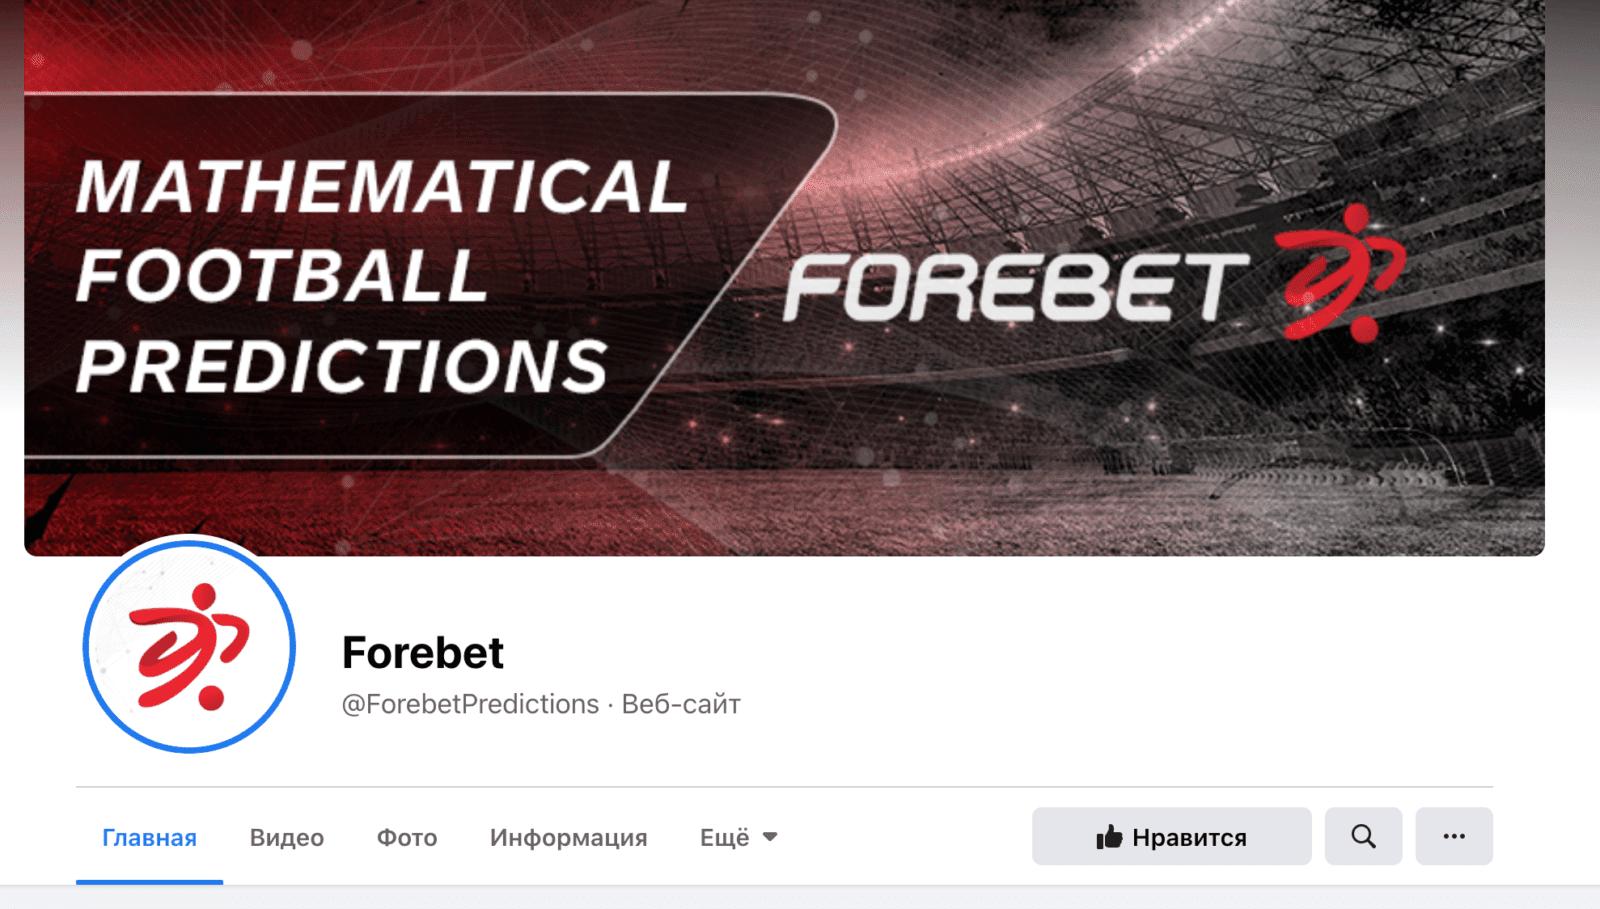 Фейсбук аккаунт Forebet.com (Форебет)